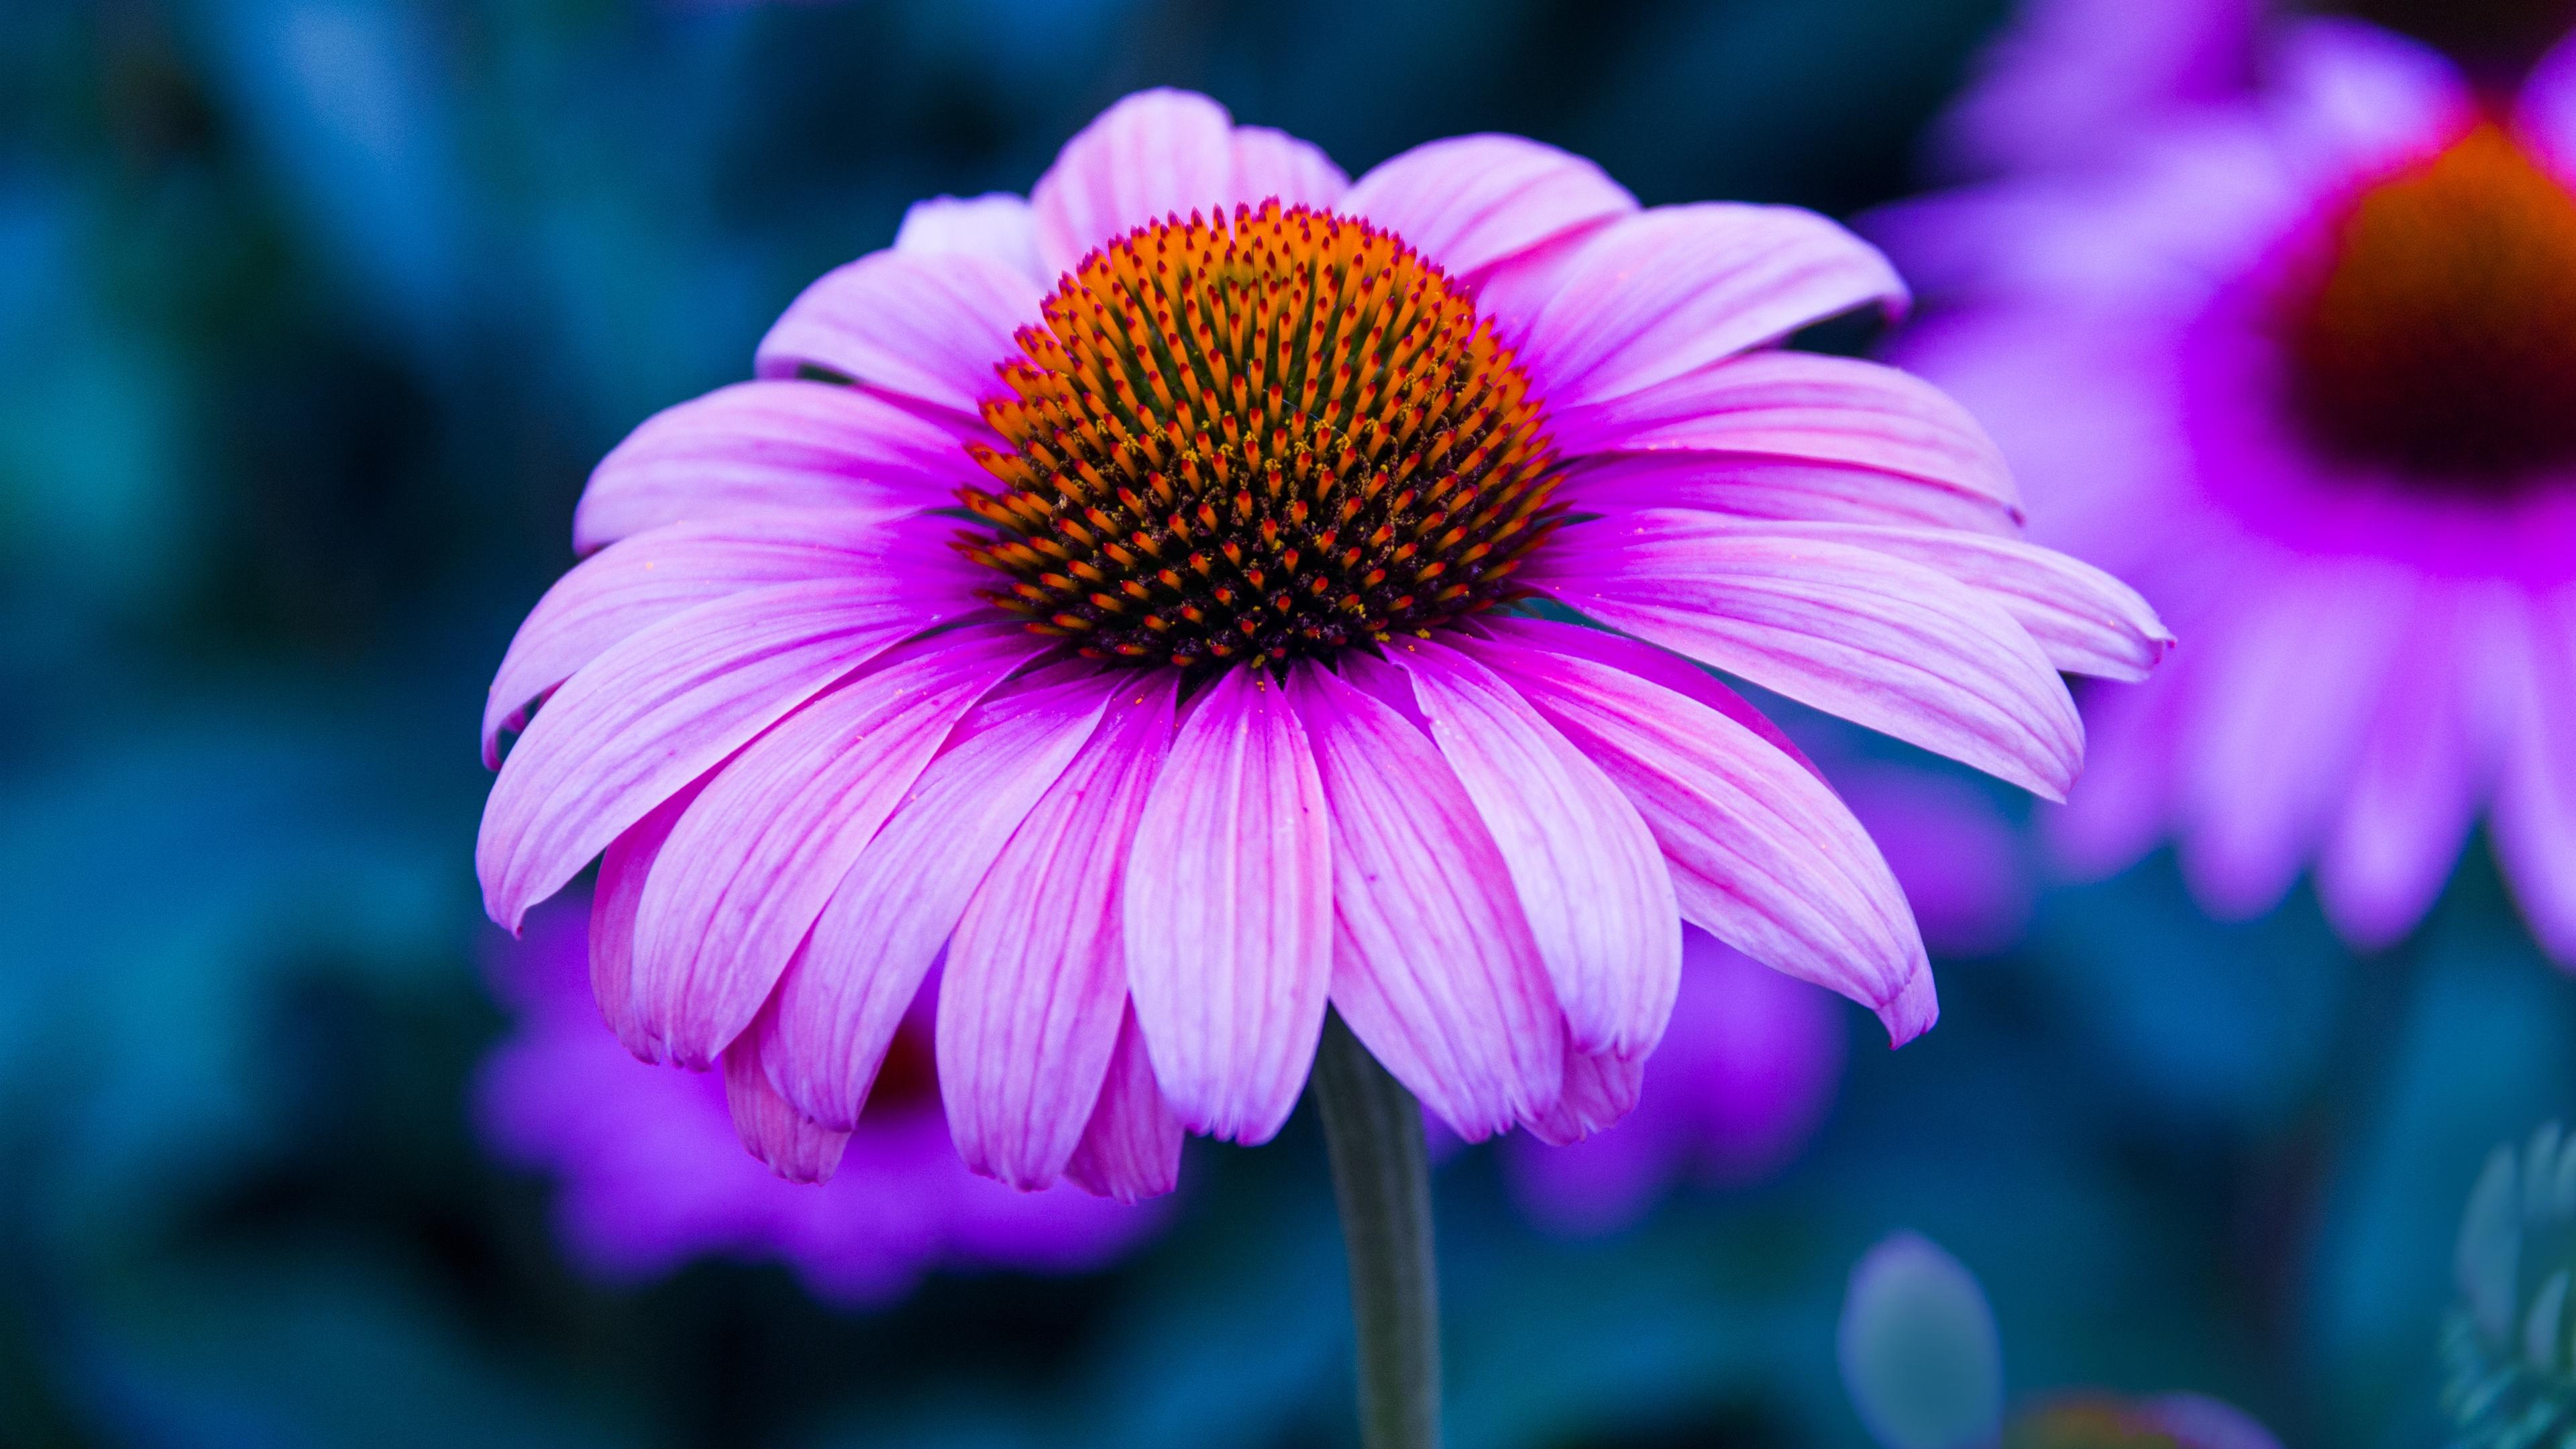 echinacea flower petals 4k 1540064369 - echinacea, flower, petals 4k - Petals, flower, echinacea